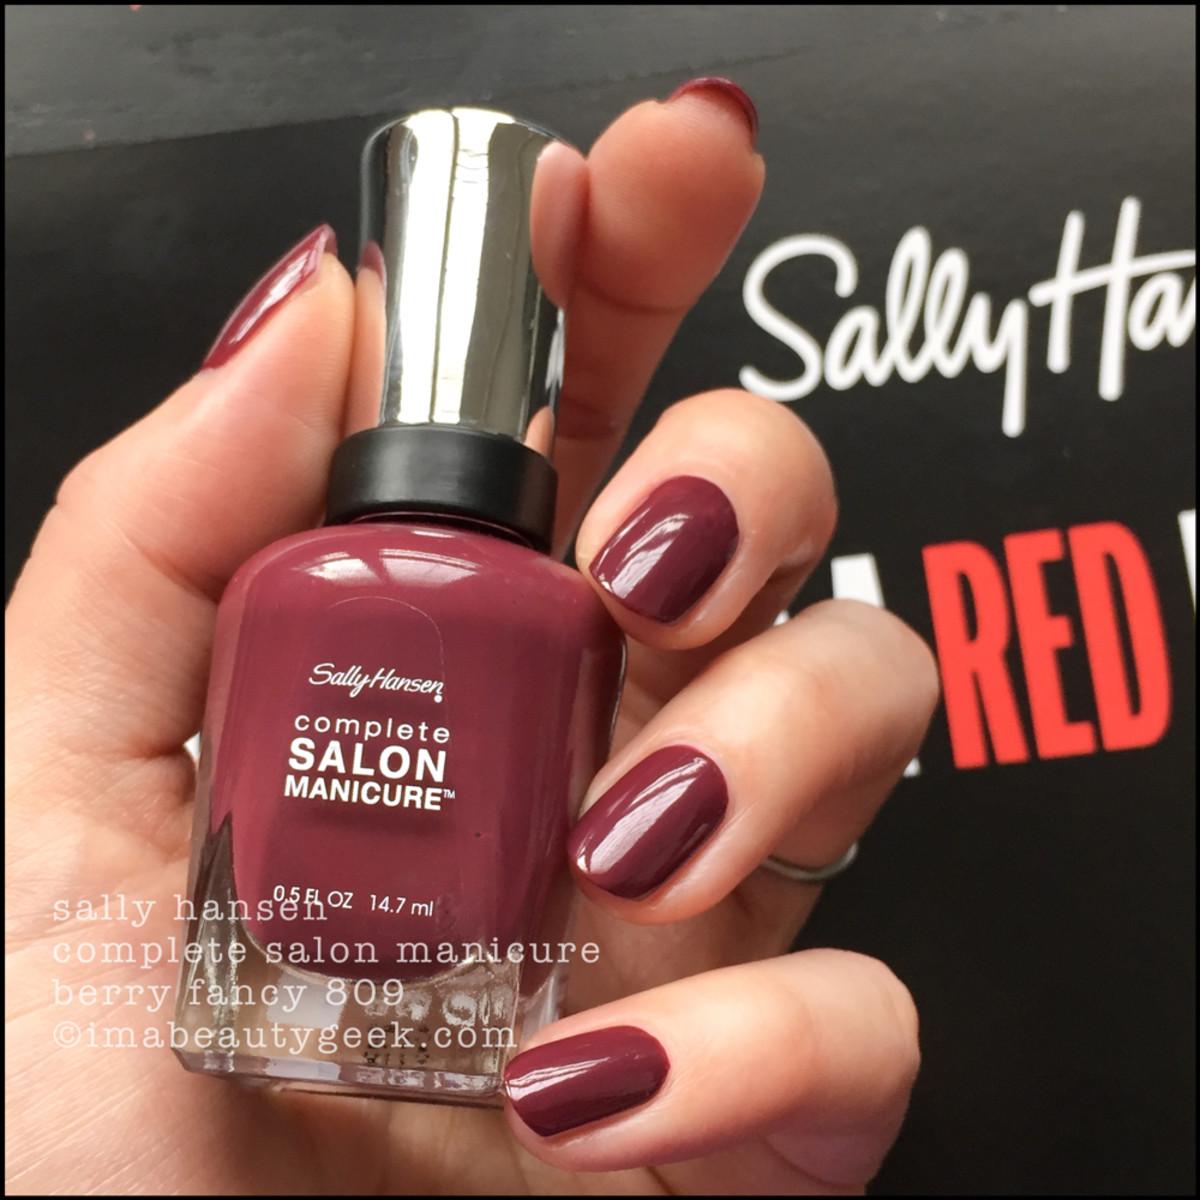 Sally Hansen Berry Fancy 809 CSM - Red/esign Collection 2018